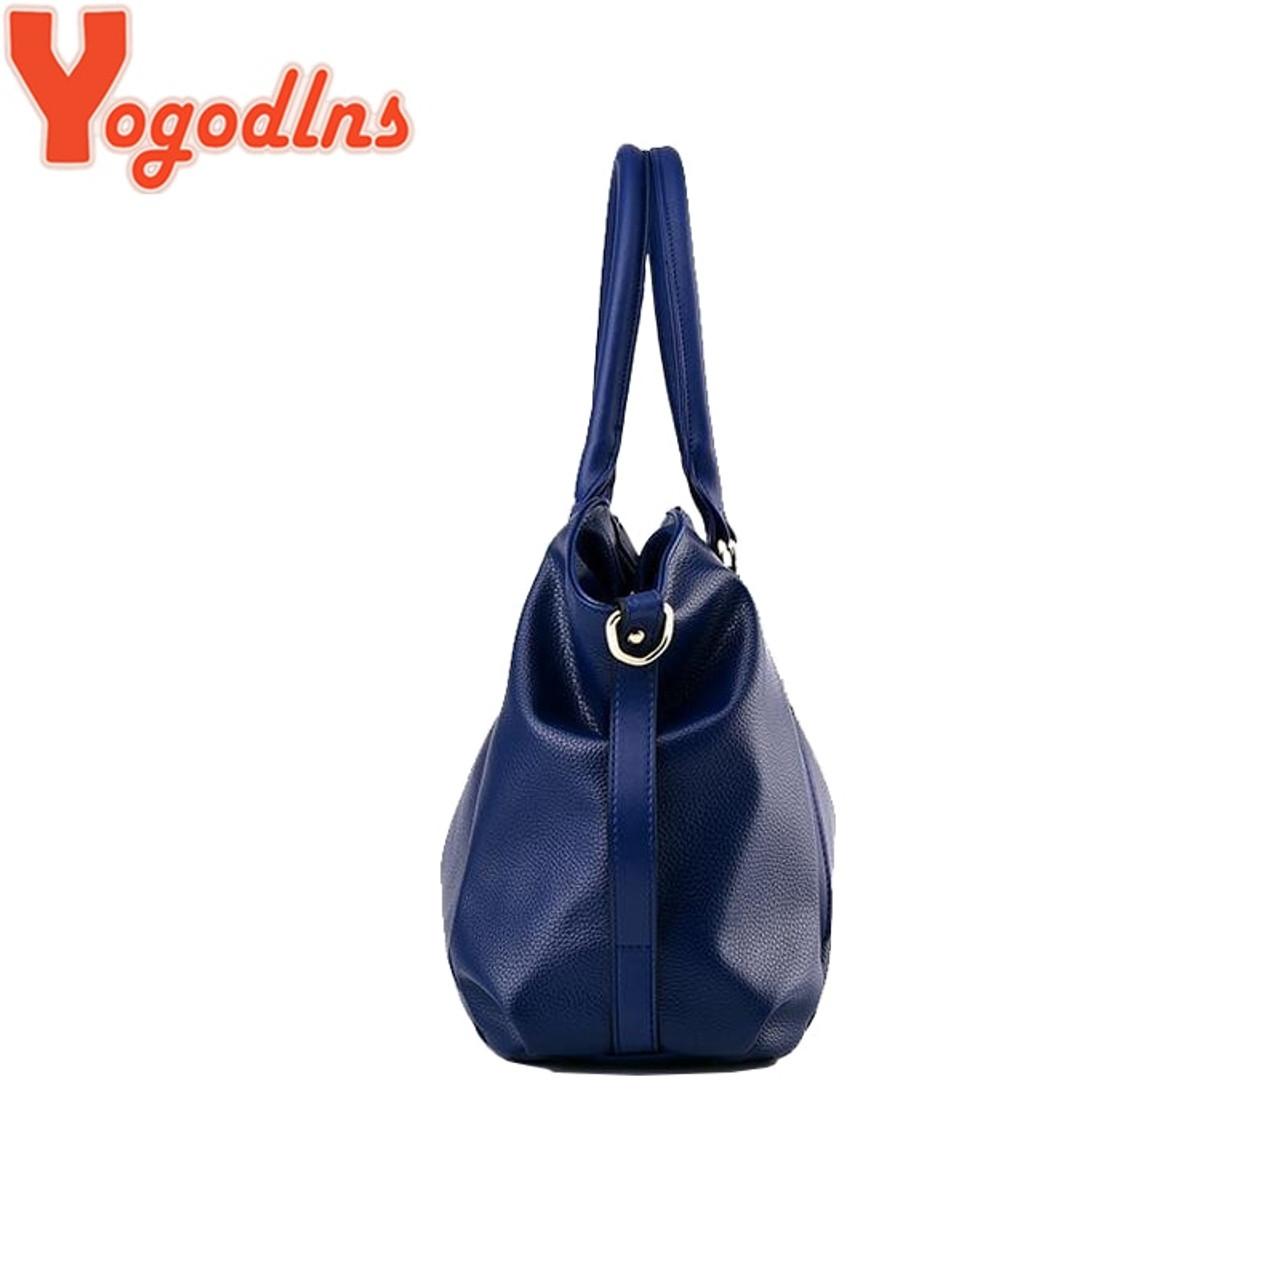 7ef78a1d2f1 ... Yogodlns Designer Women Handbag Female PU Leather Bags Handbags Ladies  Portable Shoulder Bag Office Ladies Hobos ...